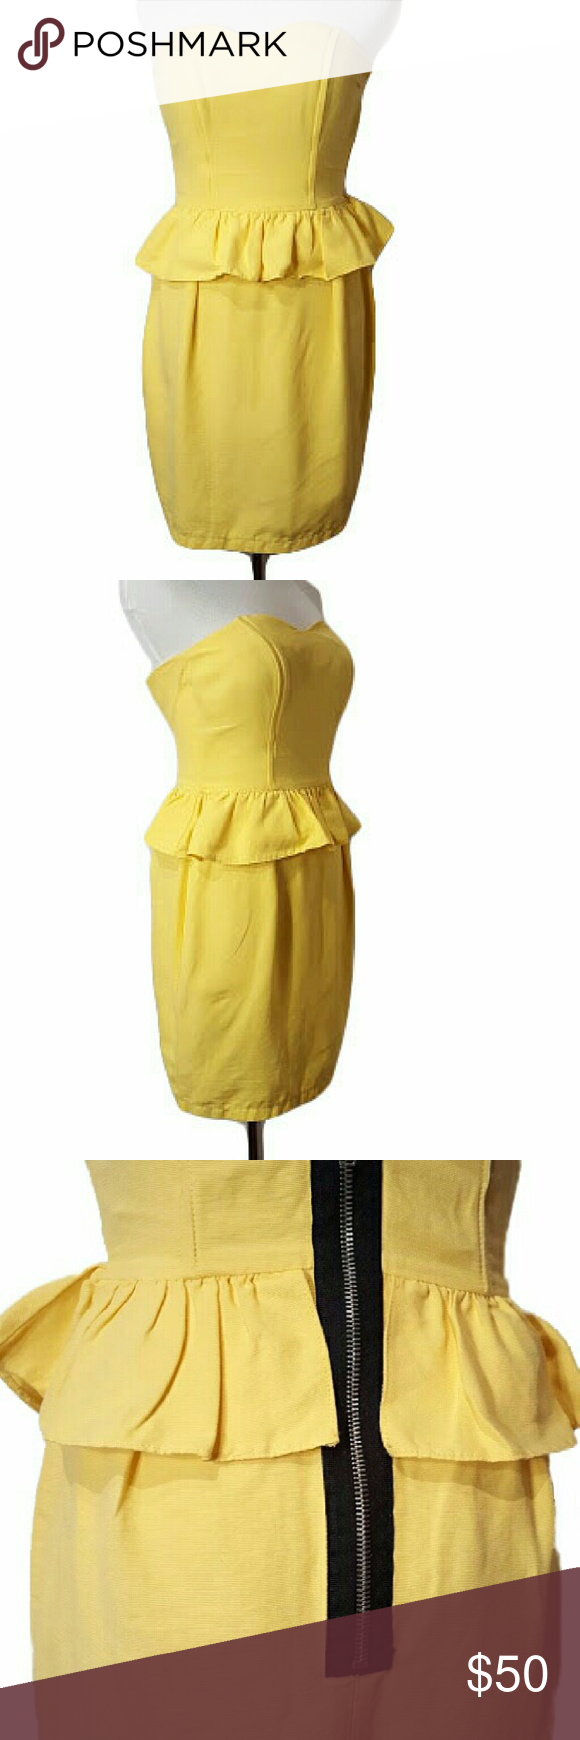 Hp Topshop Yellow Dress Yellow Strapless Dress Top Shop Dress Yellow Dress [ 1740 x 580 Pixel ]